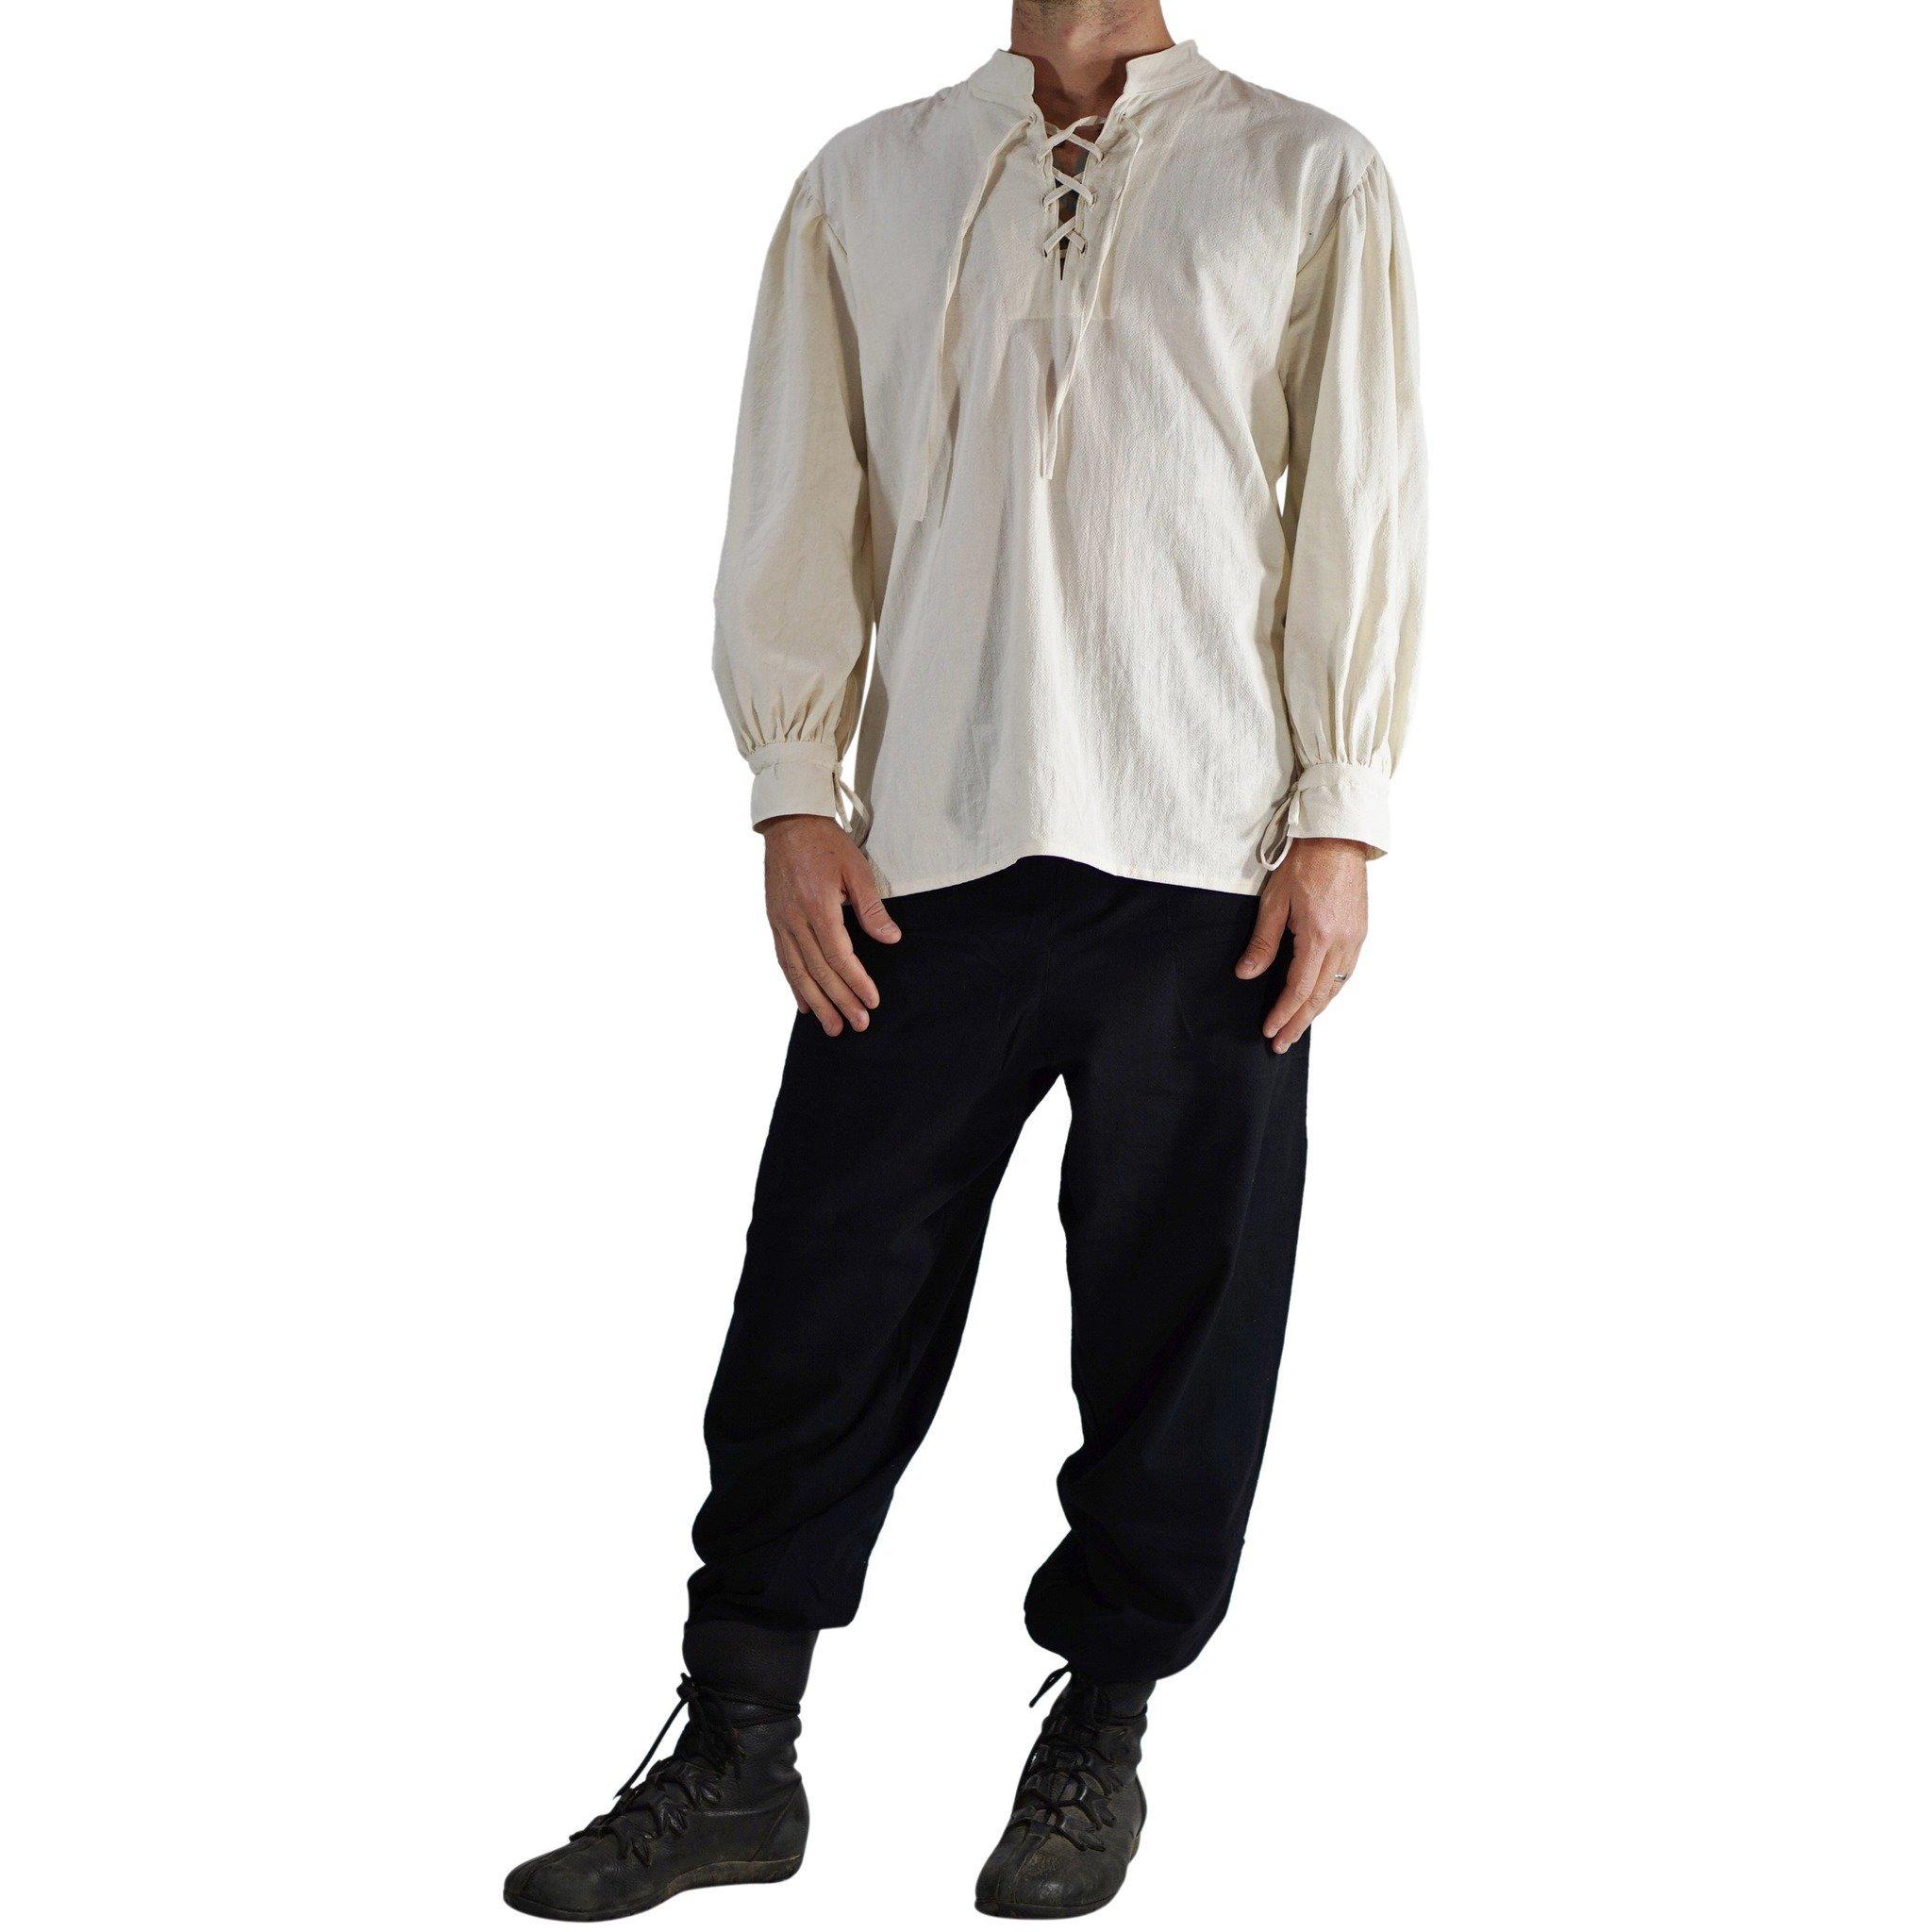 'Merchant' High Collar, Renaissance Festival Costume Shirt, Pirate, Steampunk - Cream/Off White by Zootzu (Image #4)